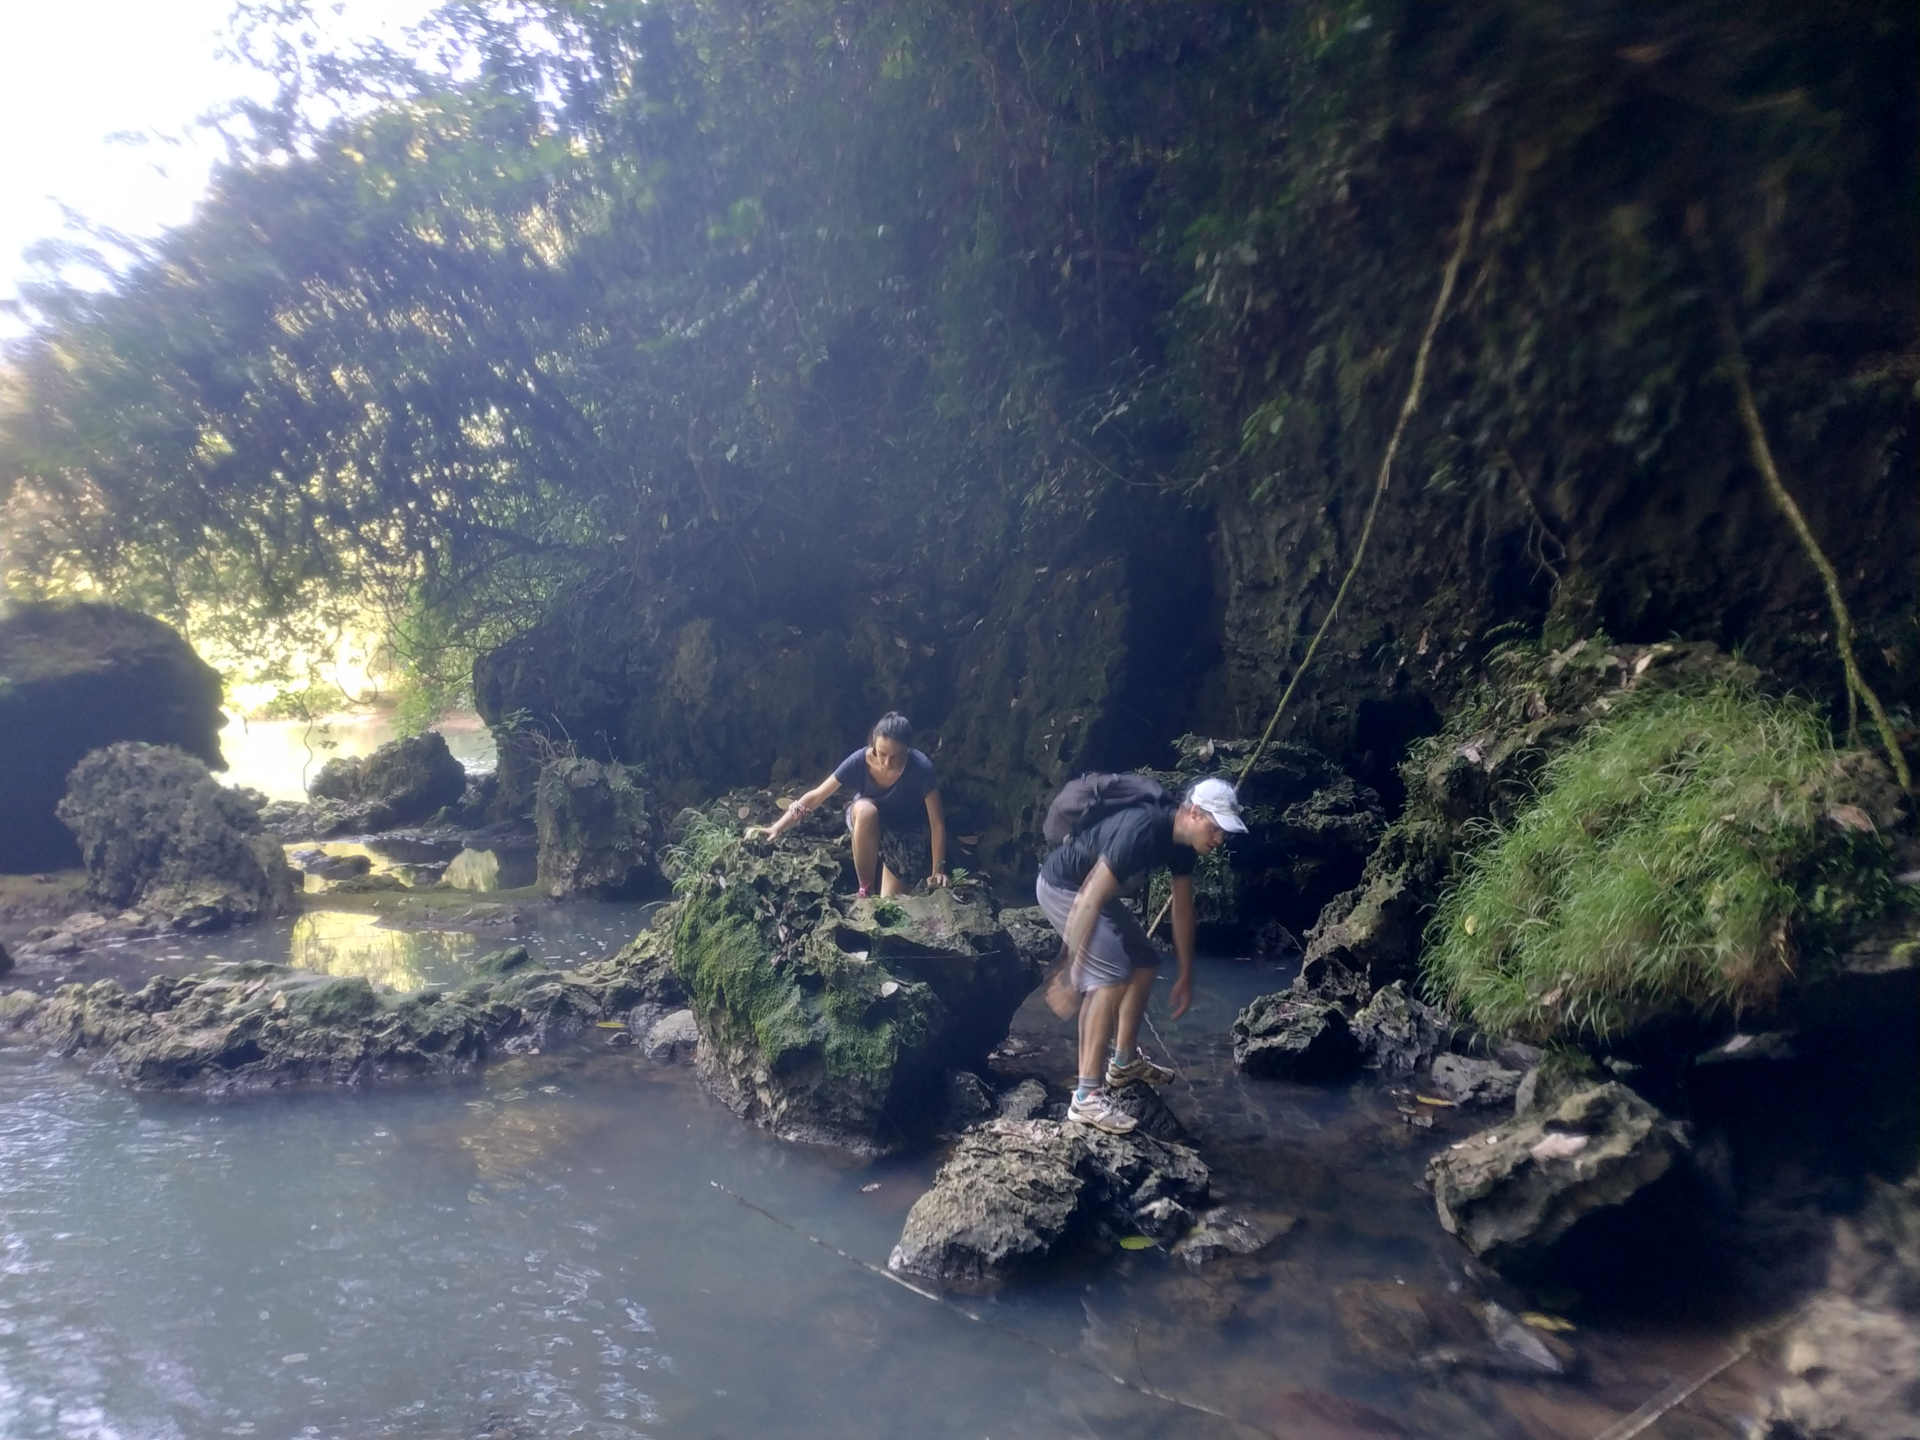 Sulawesi Maros Cave Exploration 4